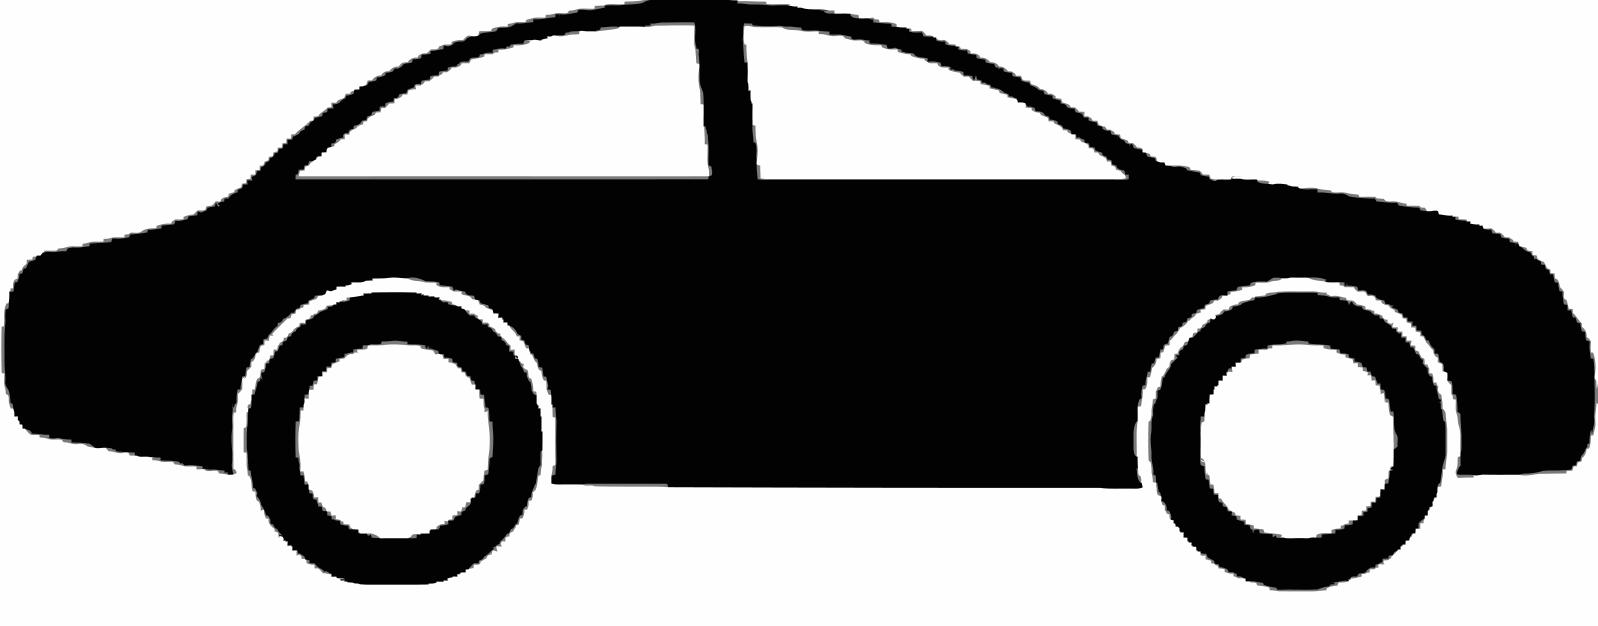 Automotive clipart graphics clipart black and white stock Automotive Clip Art & Automotive Clip Art Clip Art Images ... clipart black and white stock